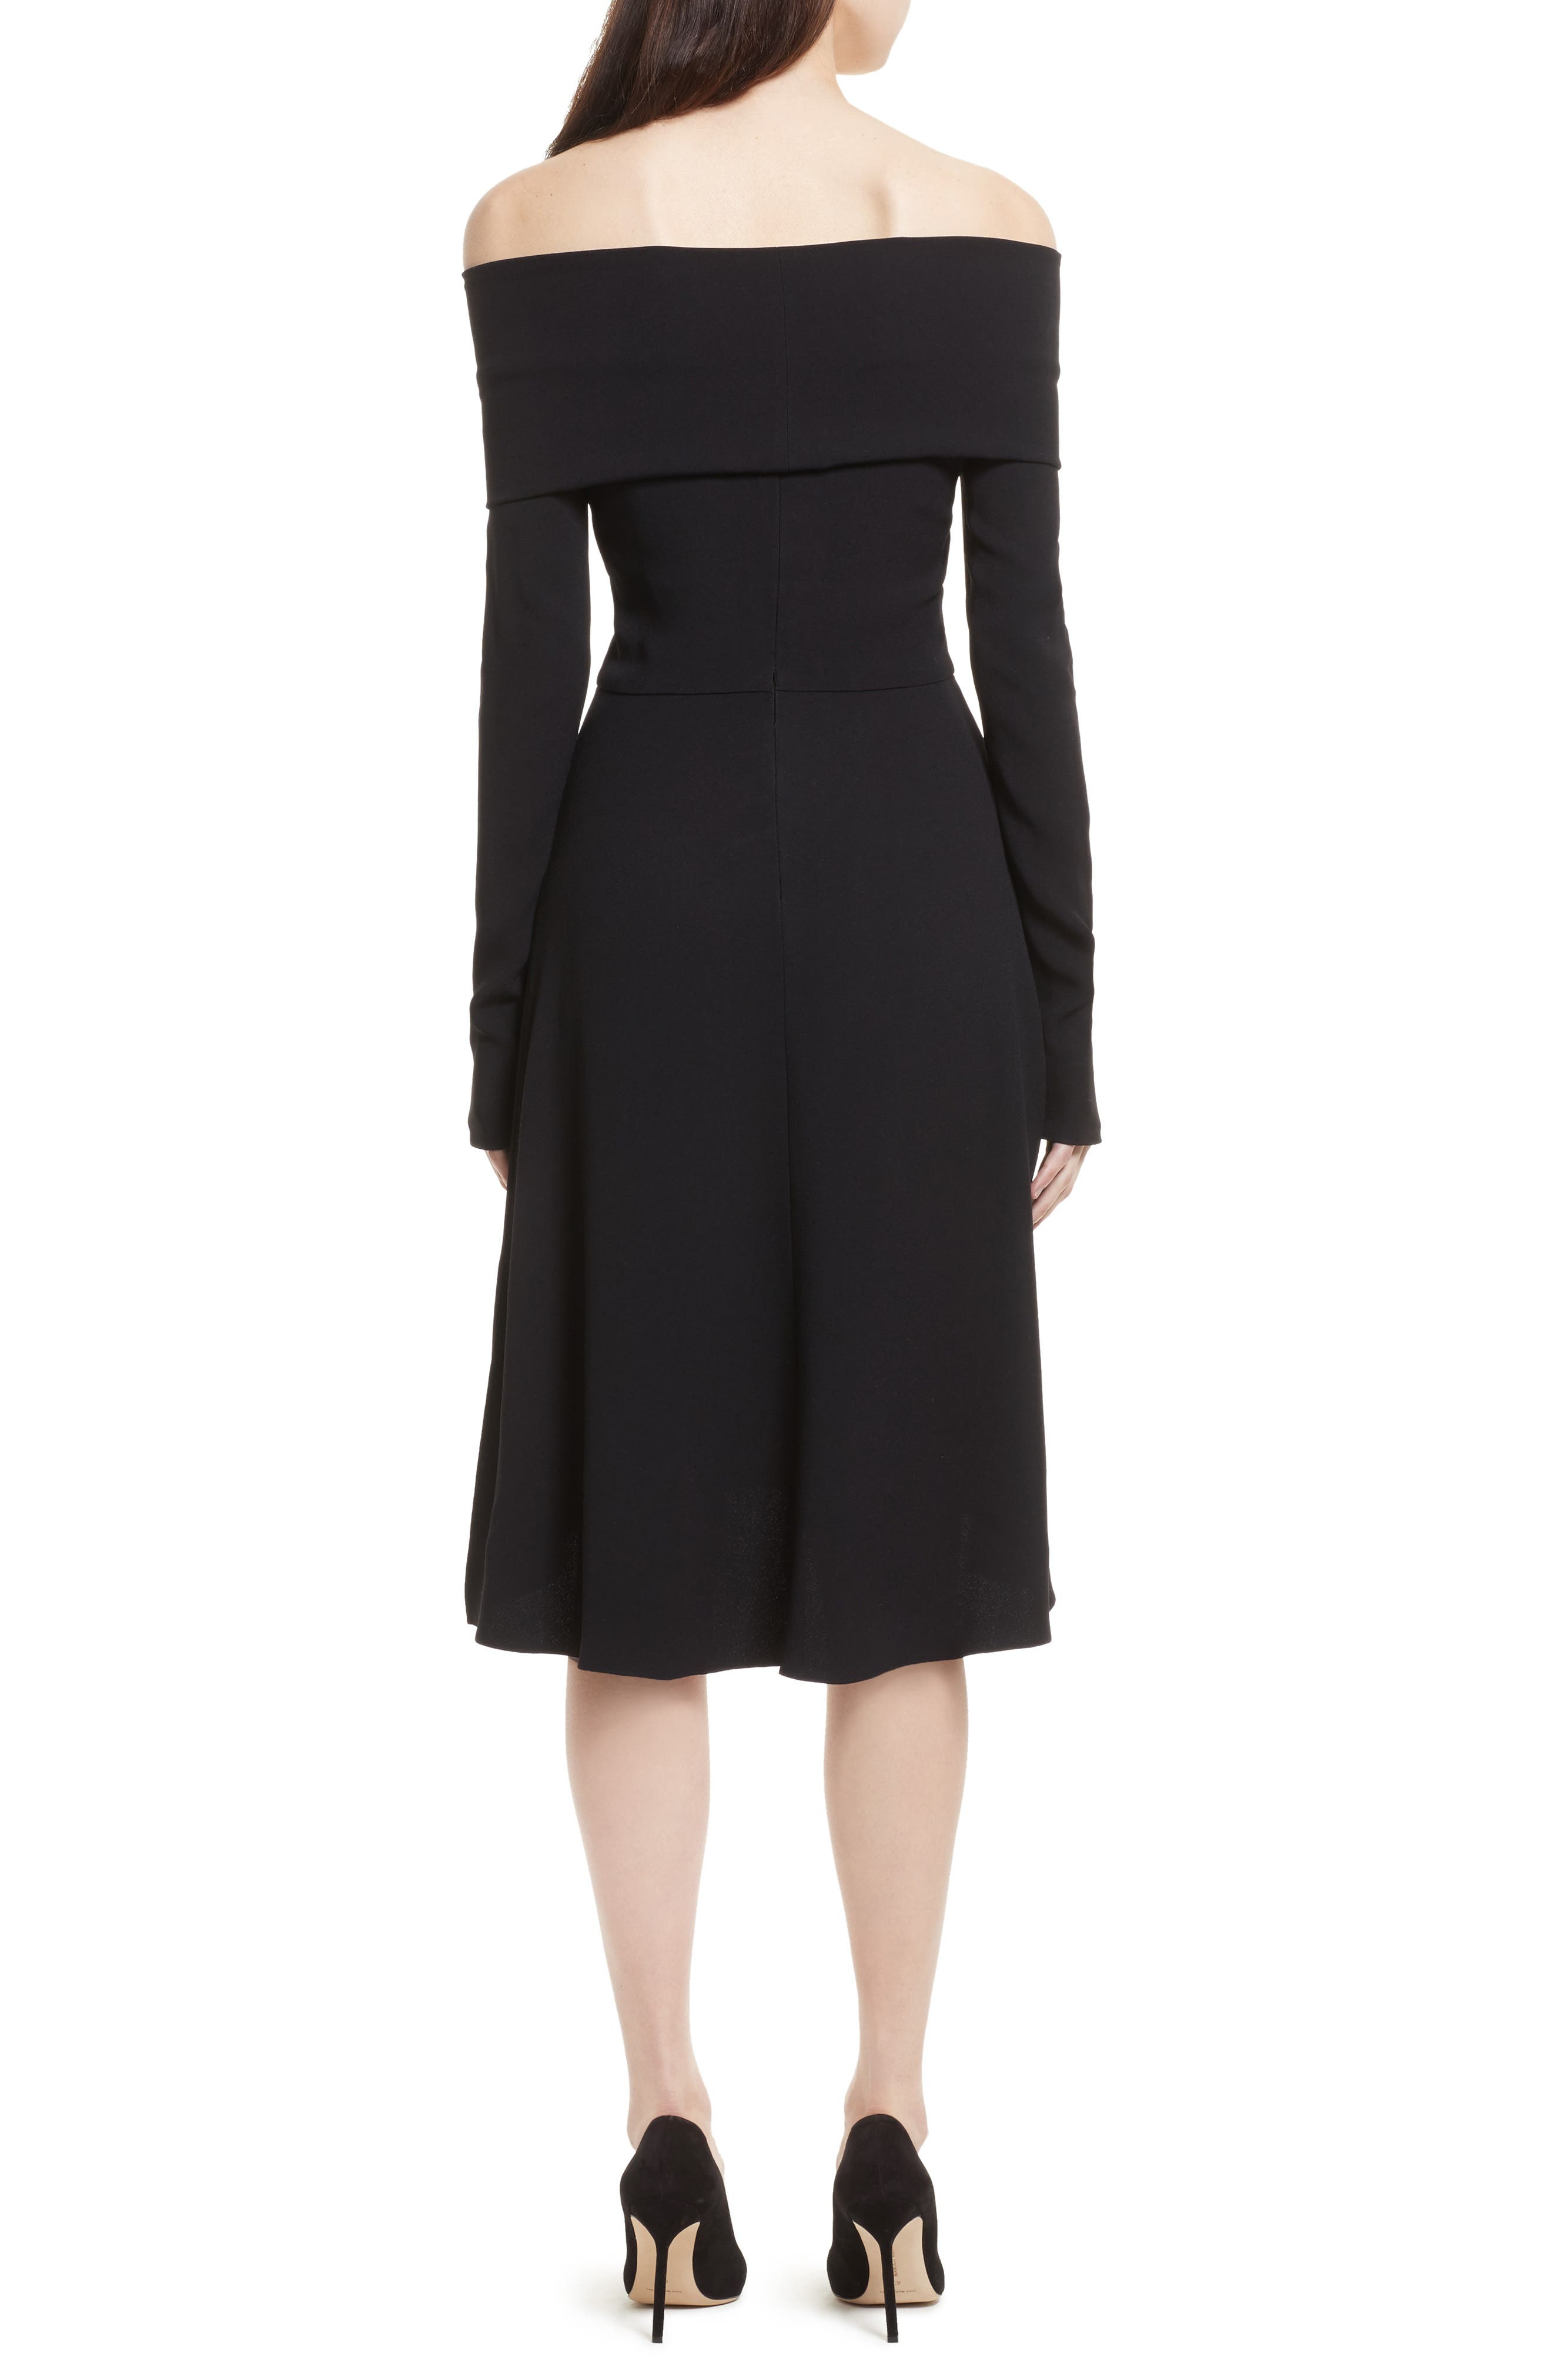 Kensington Off the Shoulder Foldover Dress,                             Alternate thumbnail 2, color,                             001